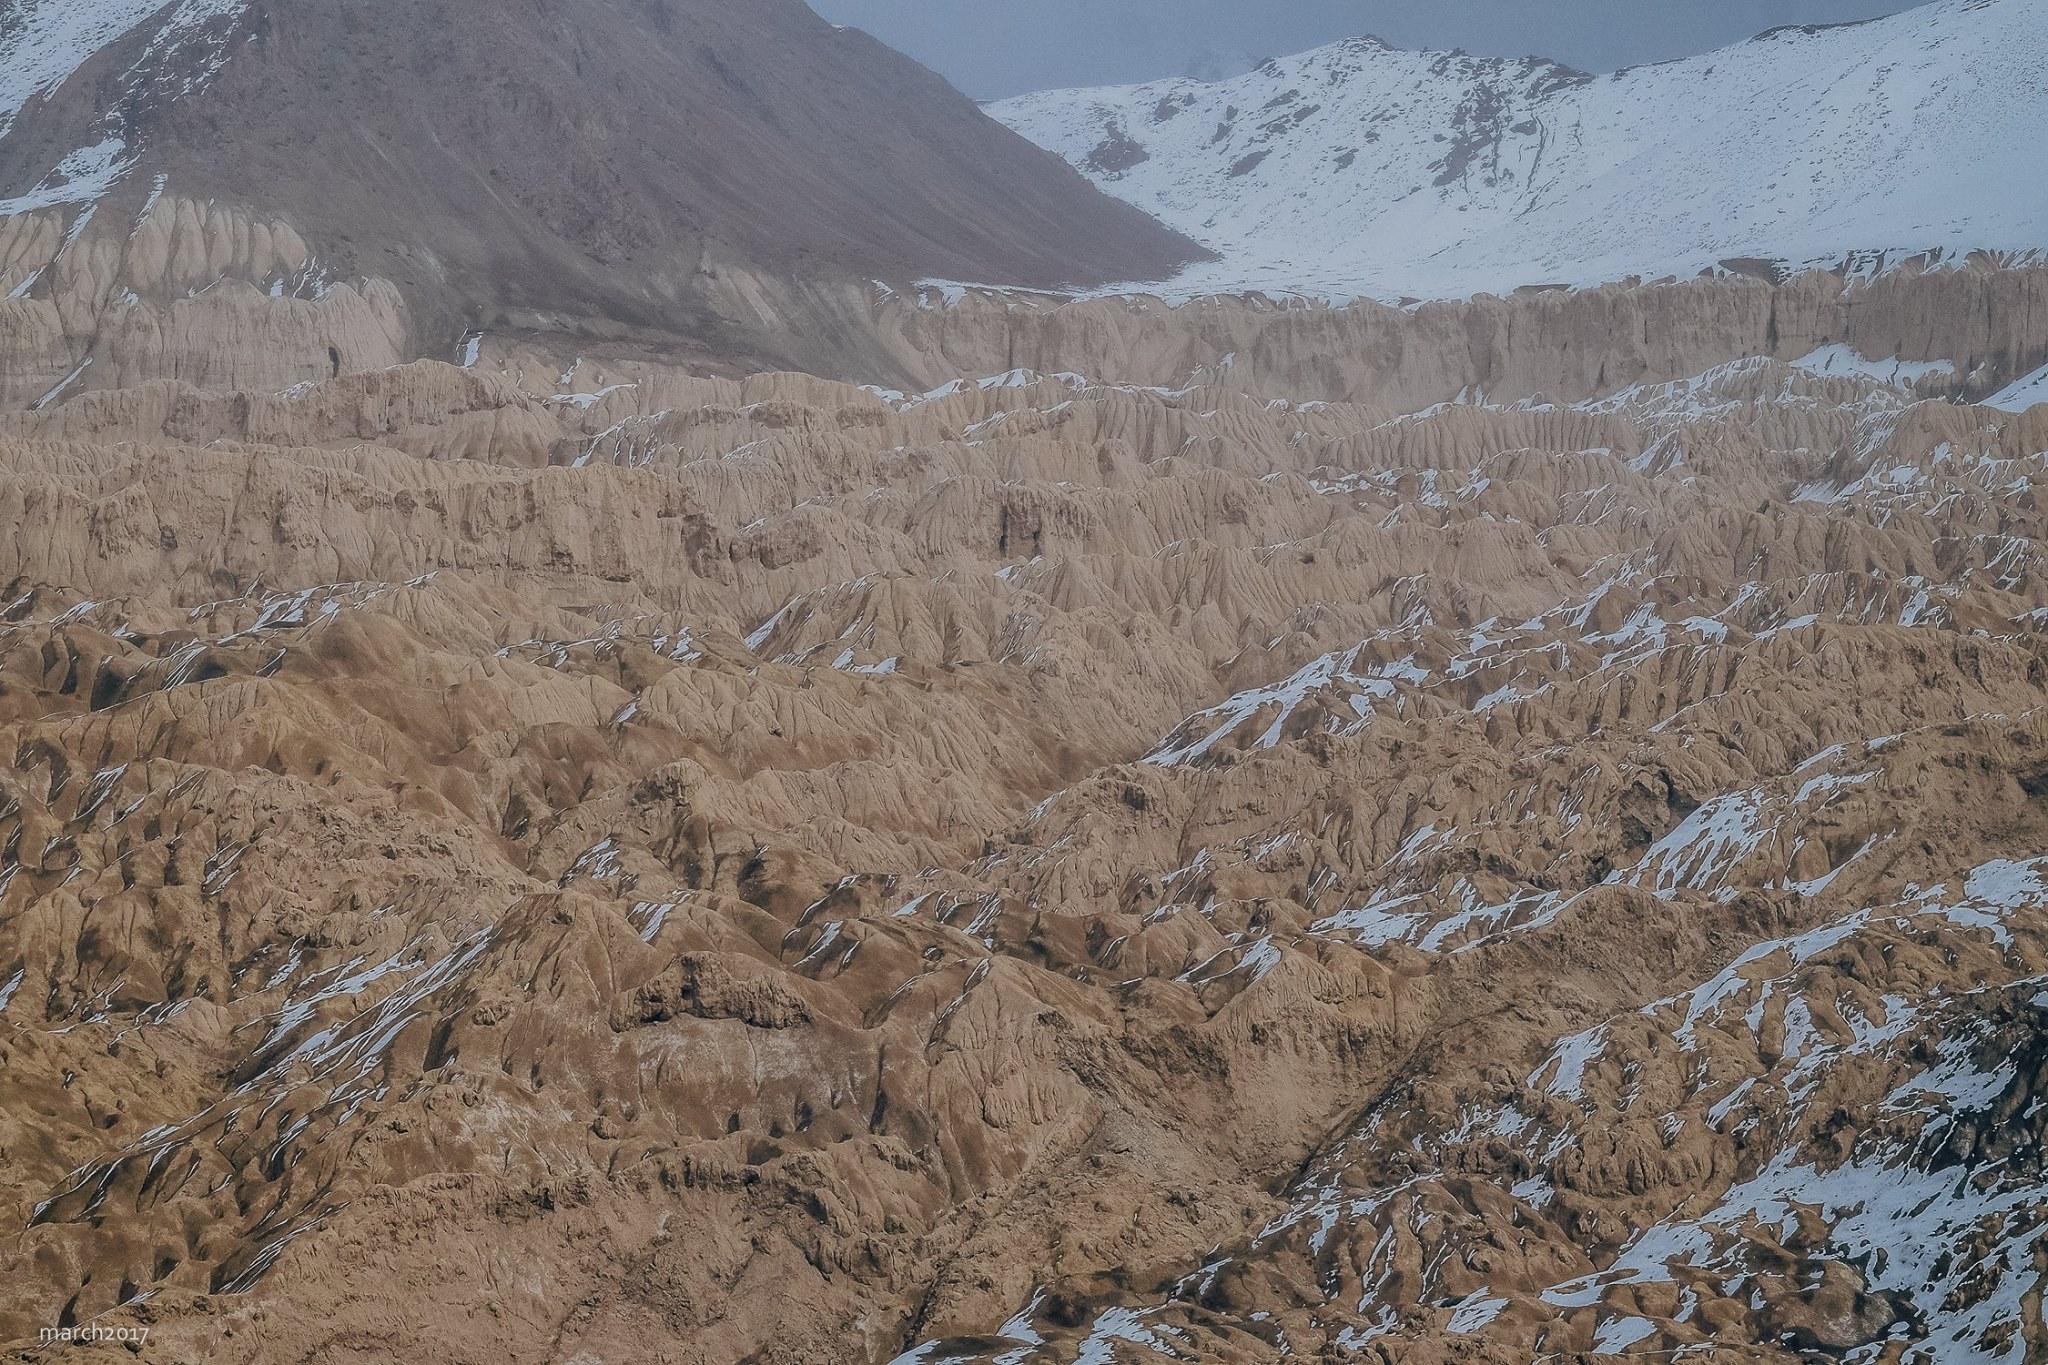 Lamayuru, the moon land of Ladakh